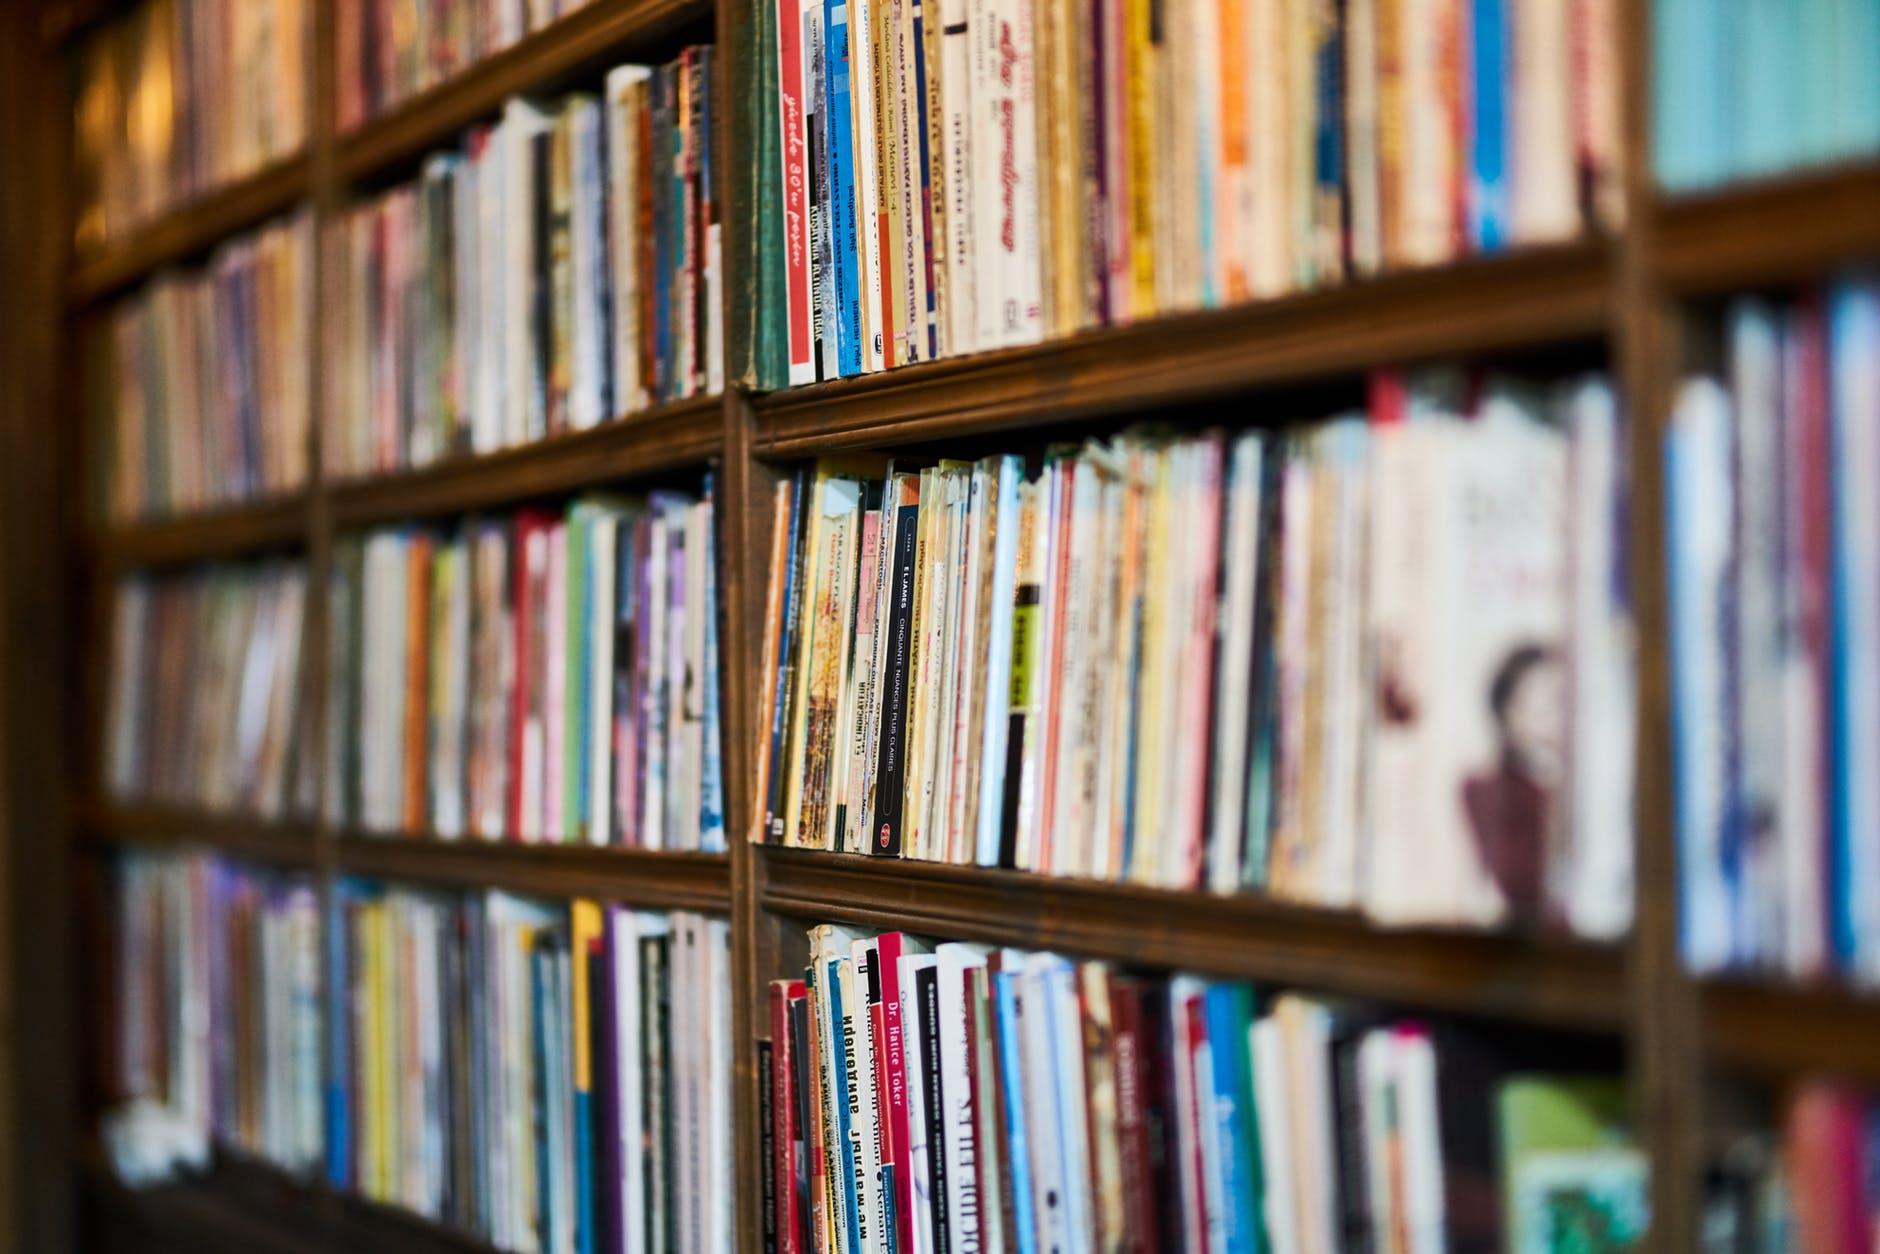 assorted books on wooden shelf